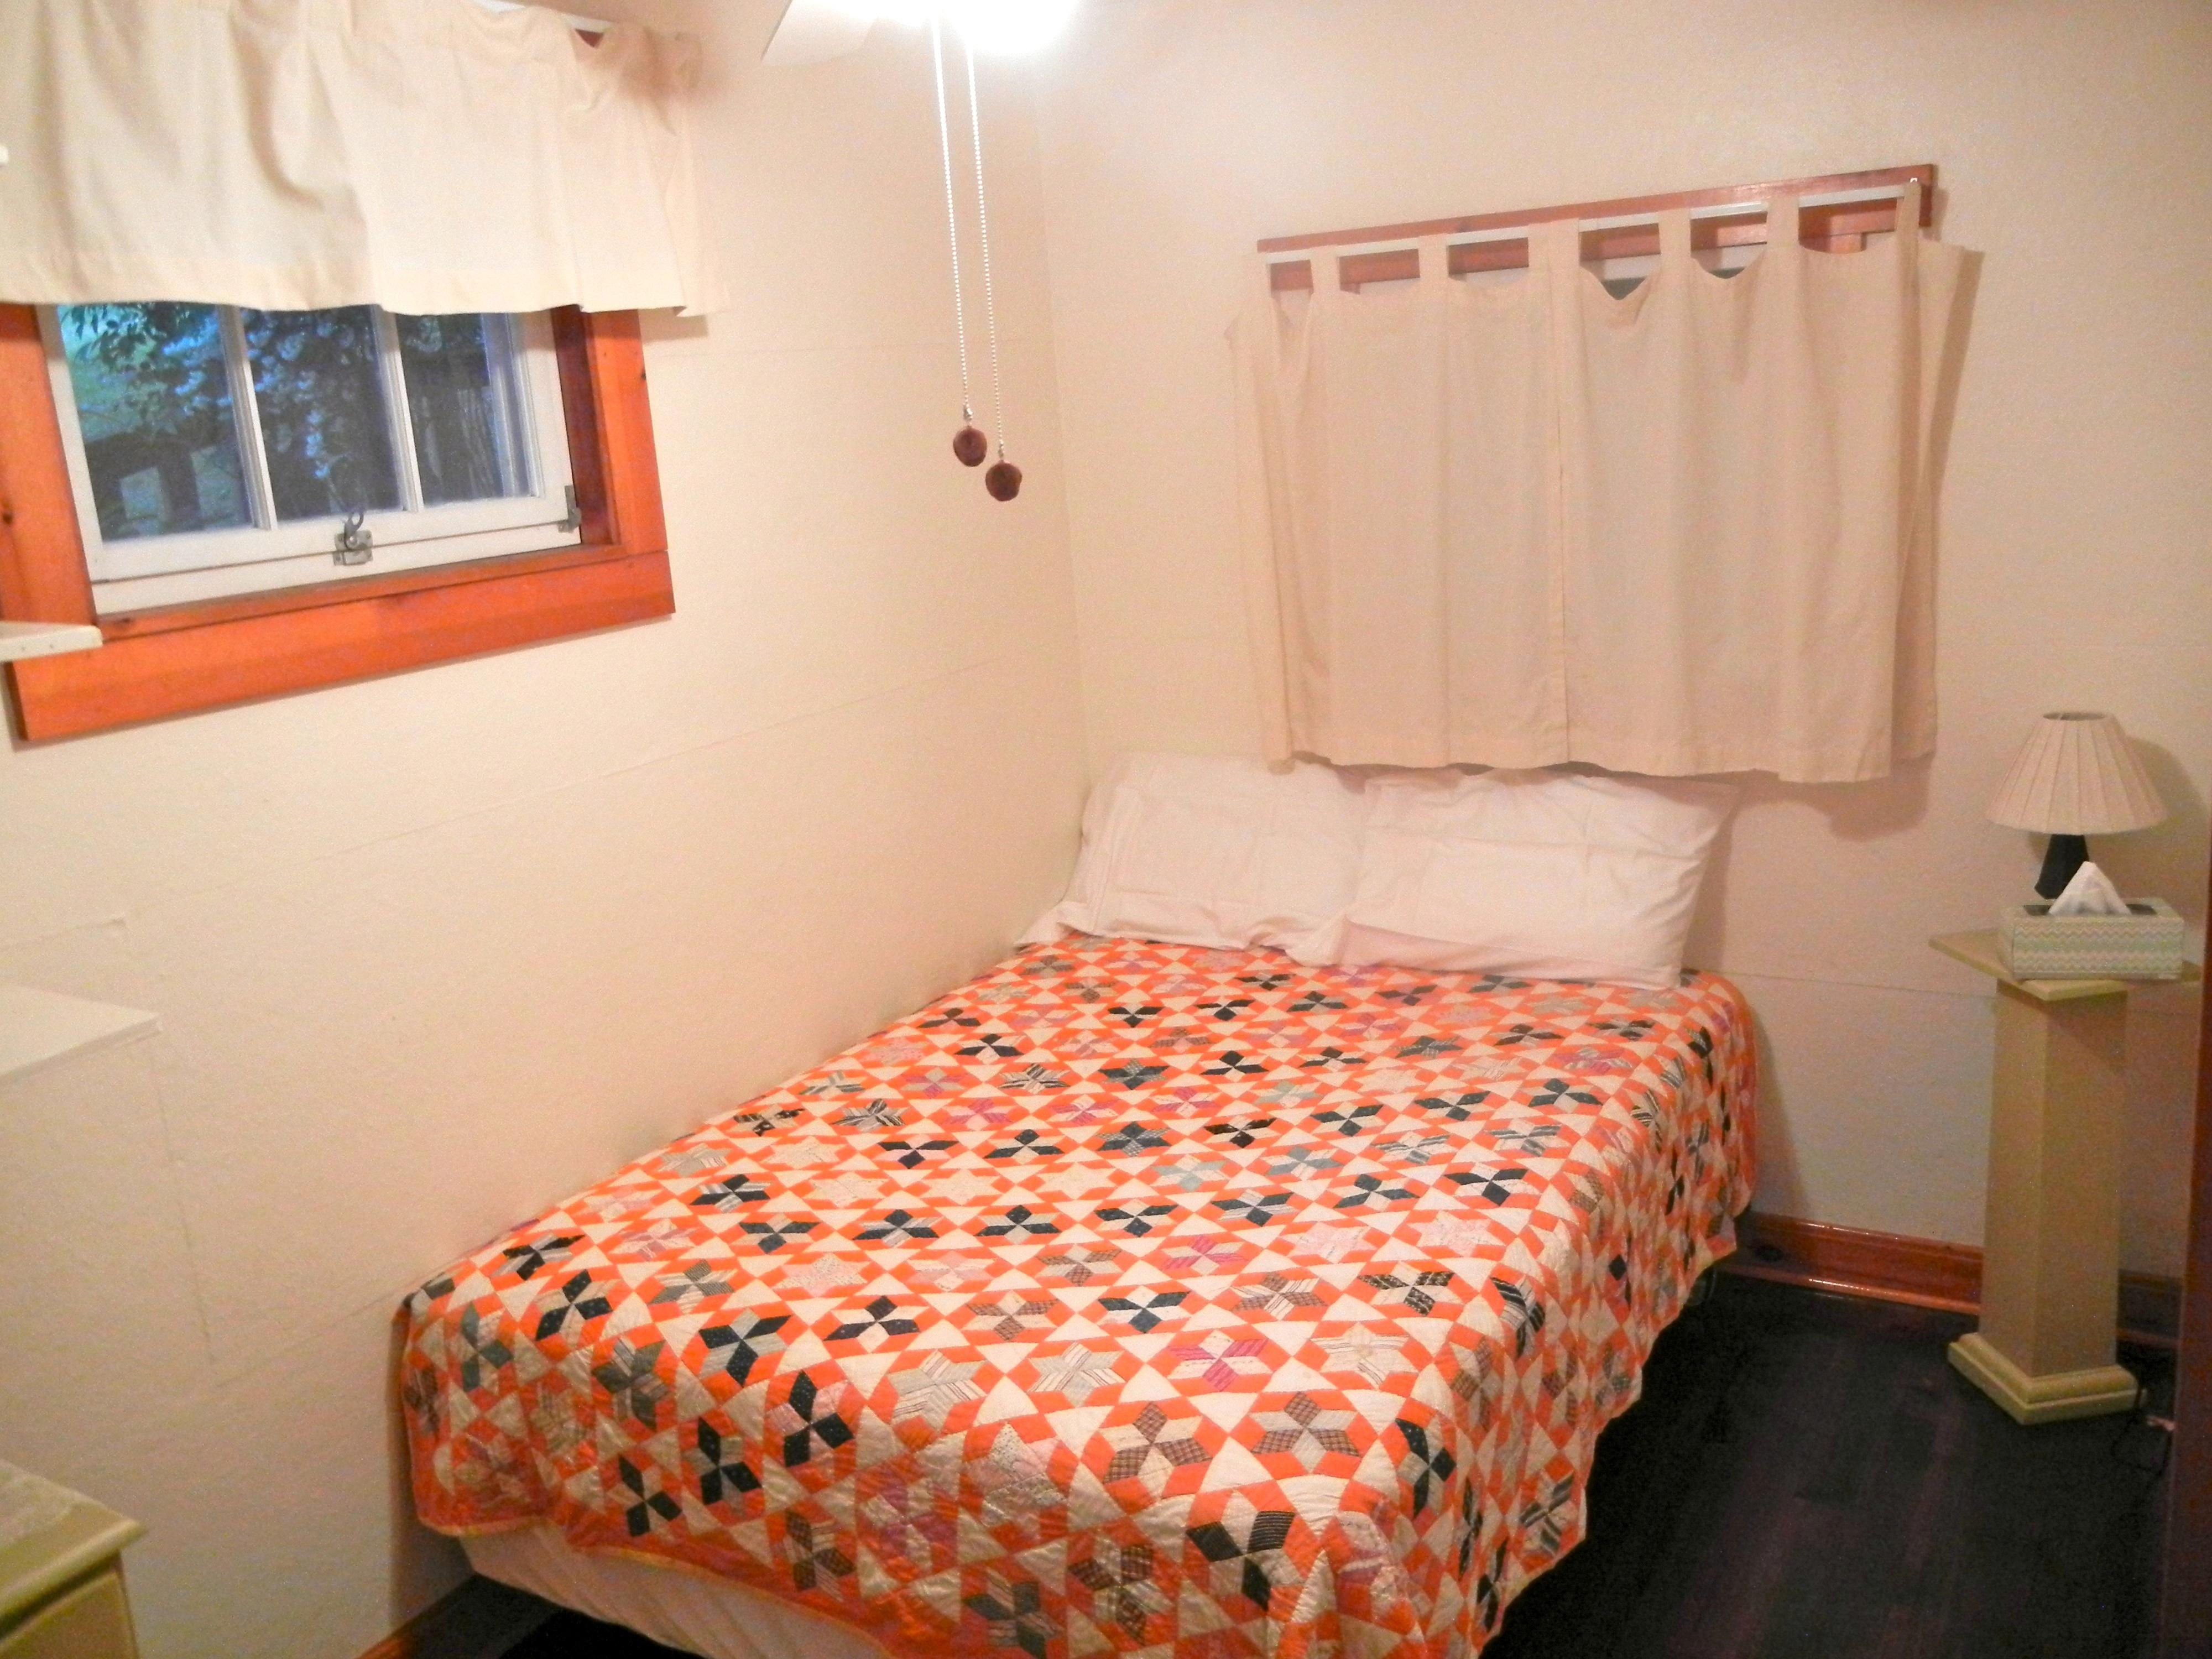 https://0201.nccdn.net/1_2/000/000/166/873/bedroom-1_downstairs-4000x3000.jpg